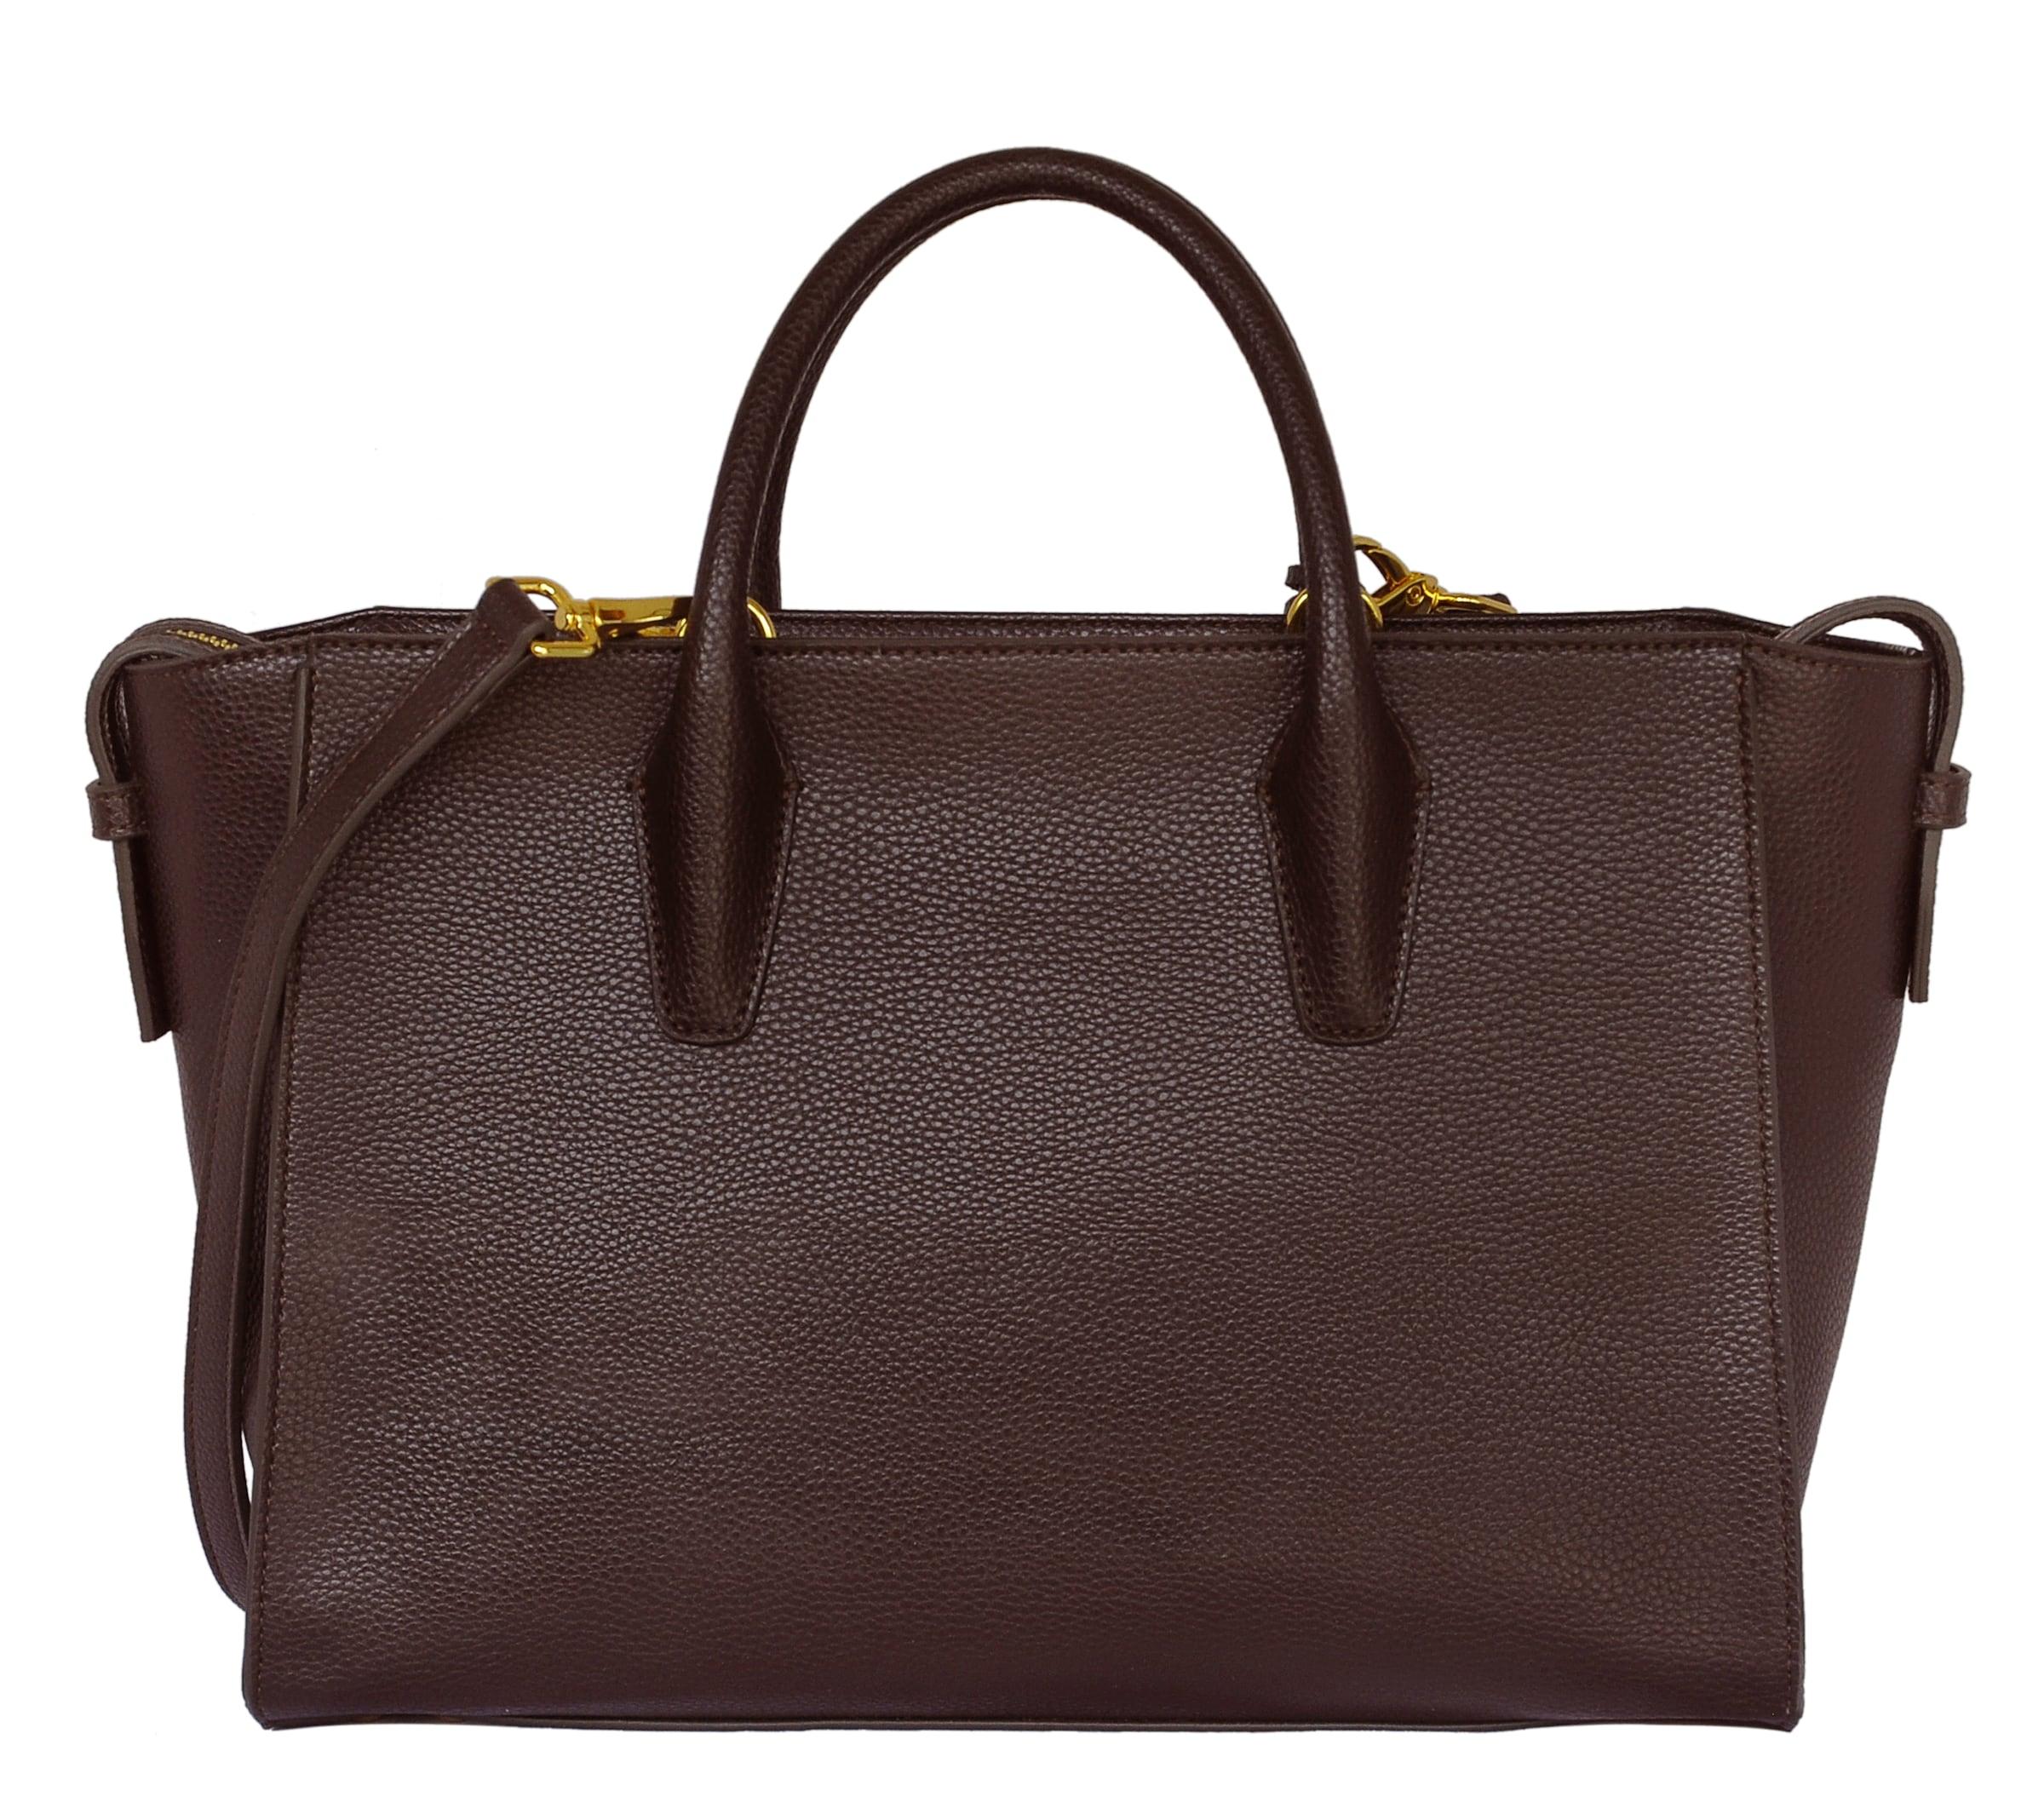 Handtasche In Silvio Silvio Tossi Tossi Schoko X8wON0Pkn